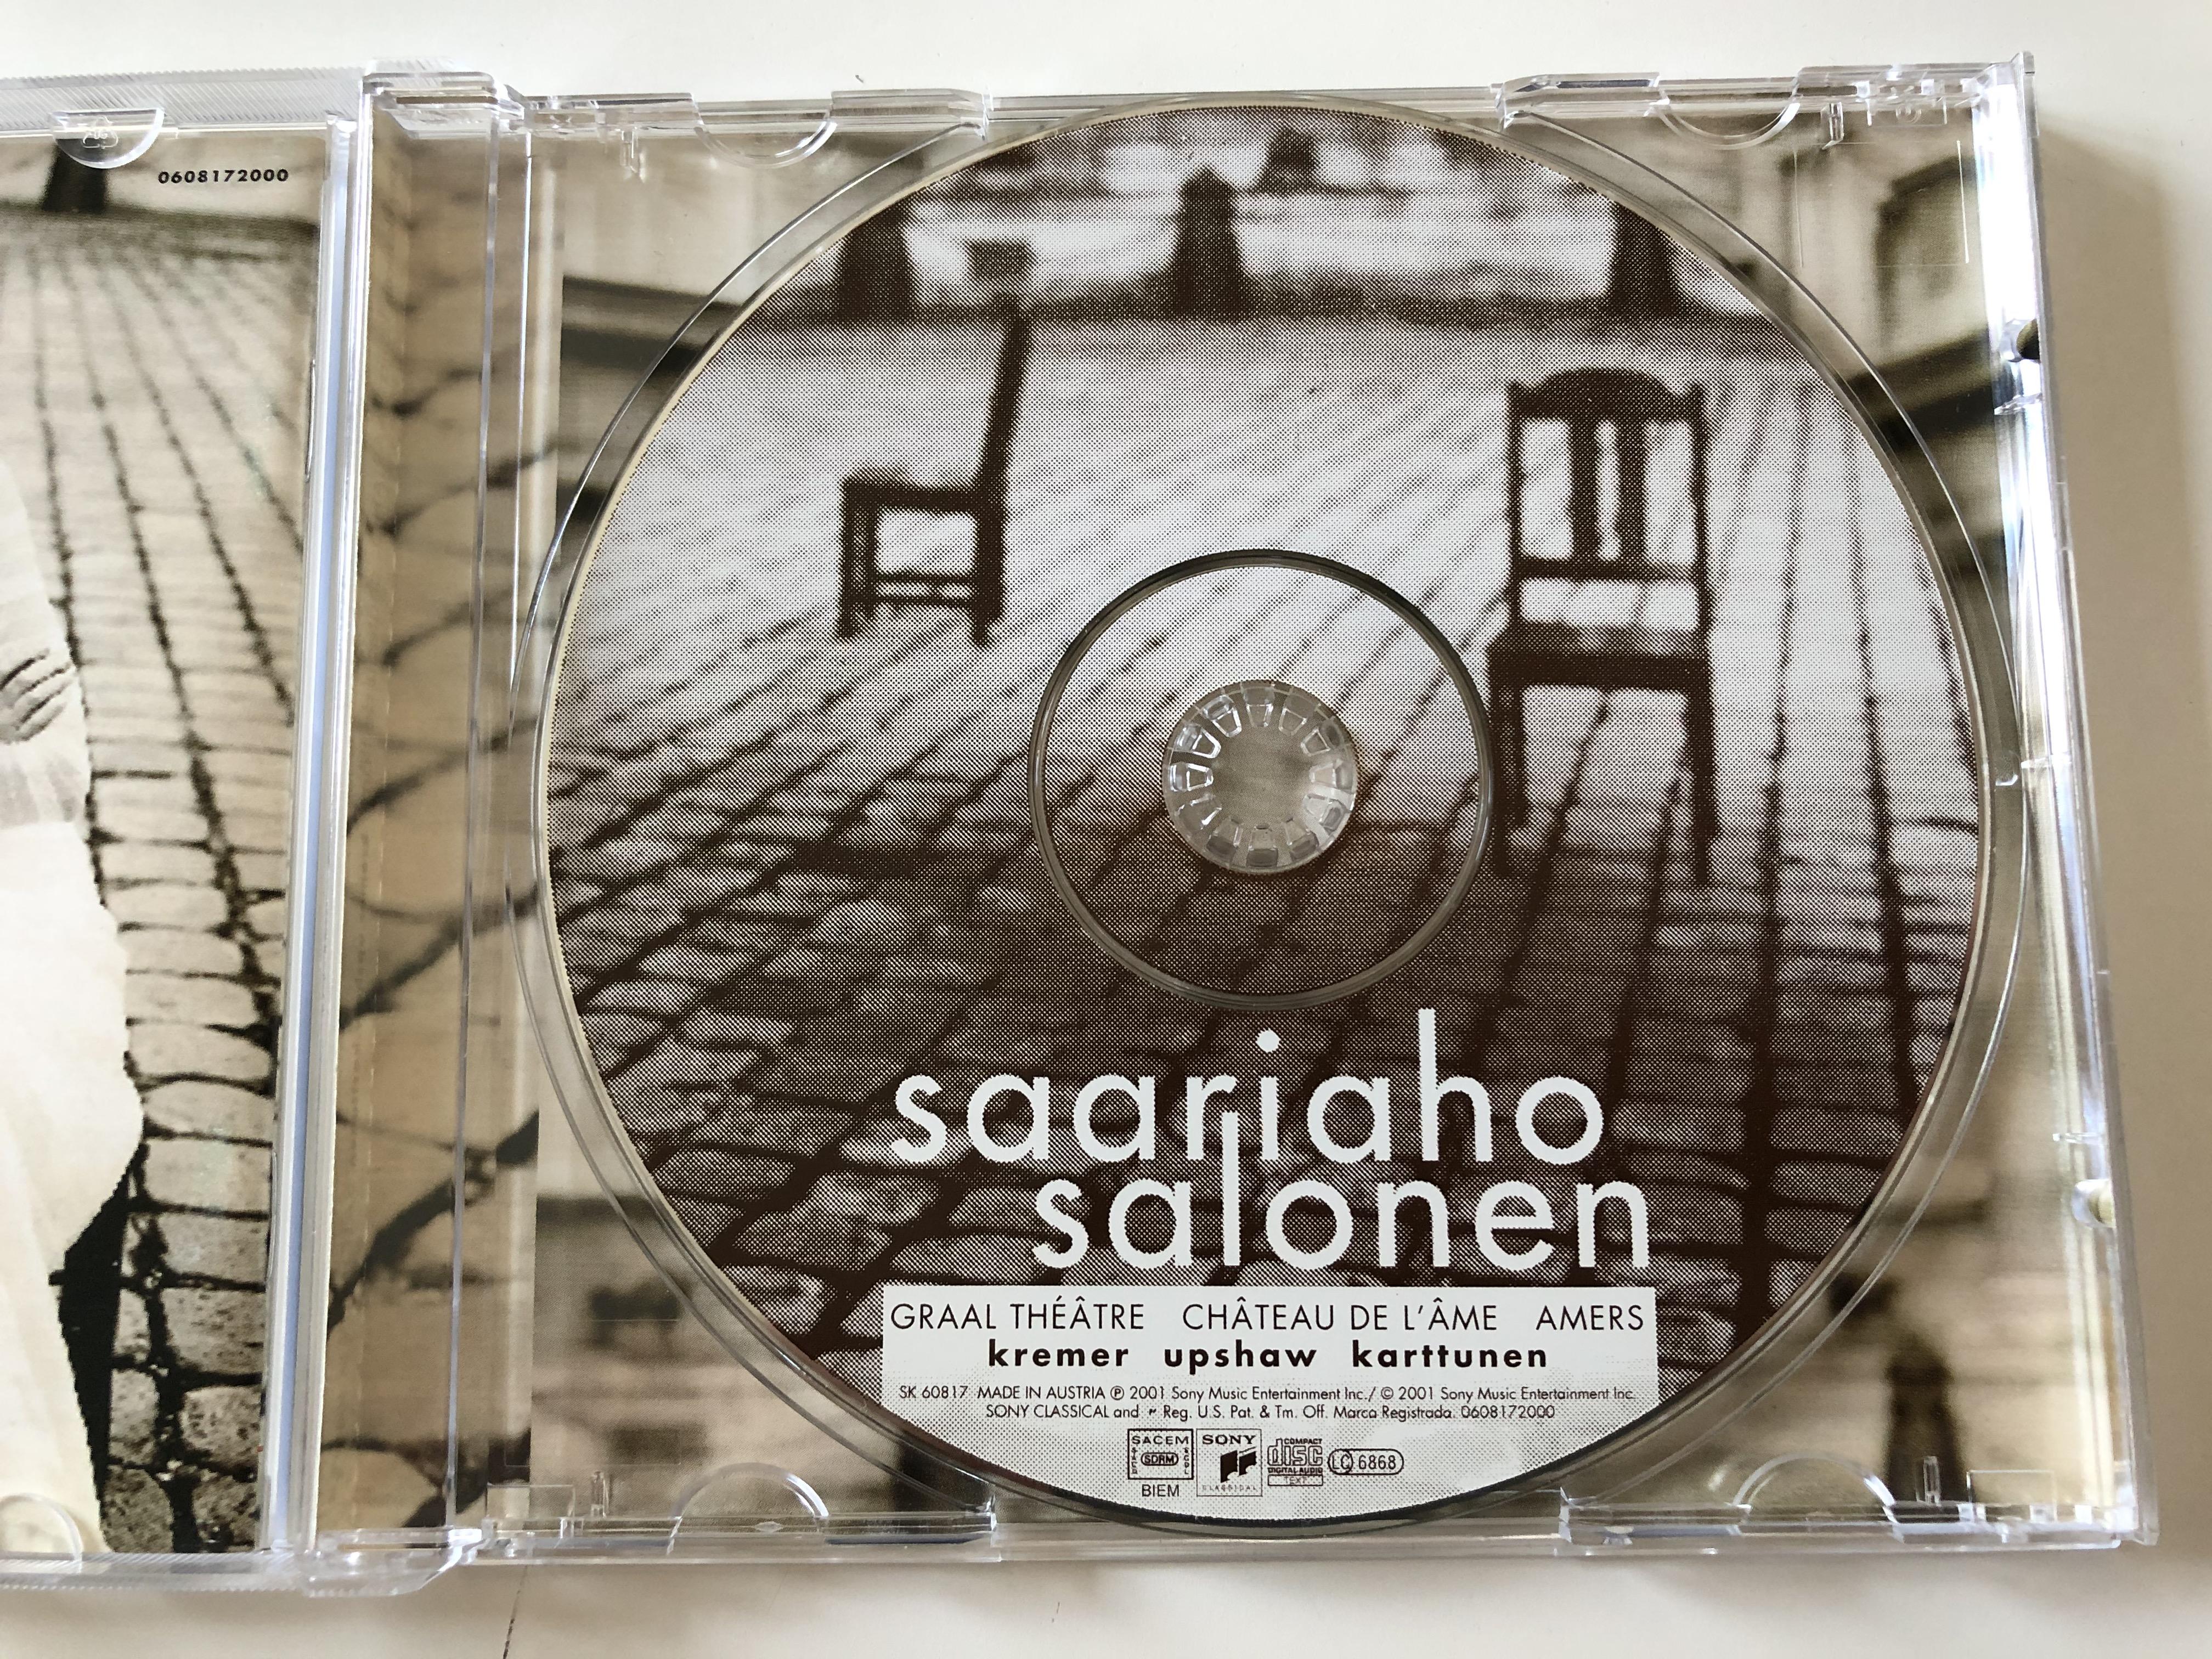 kaija-saariaho-ch-teau-de-l-me-graal-th-tre-amers-esa-pekka-salonen-sony-classical-audio-cd-2001-sk-60817-7-.jpg